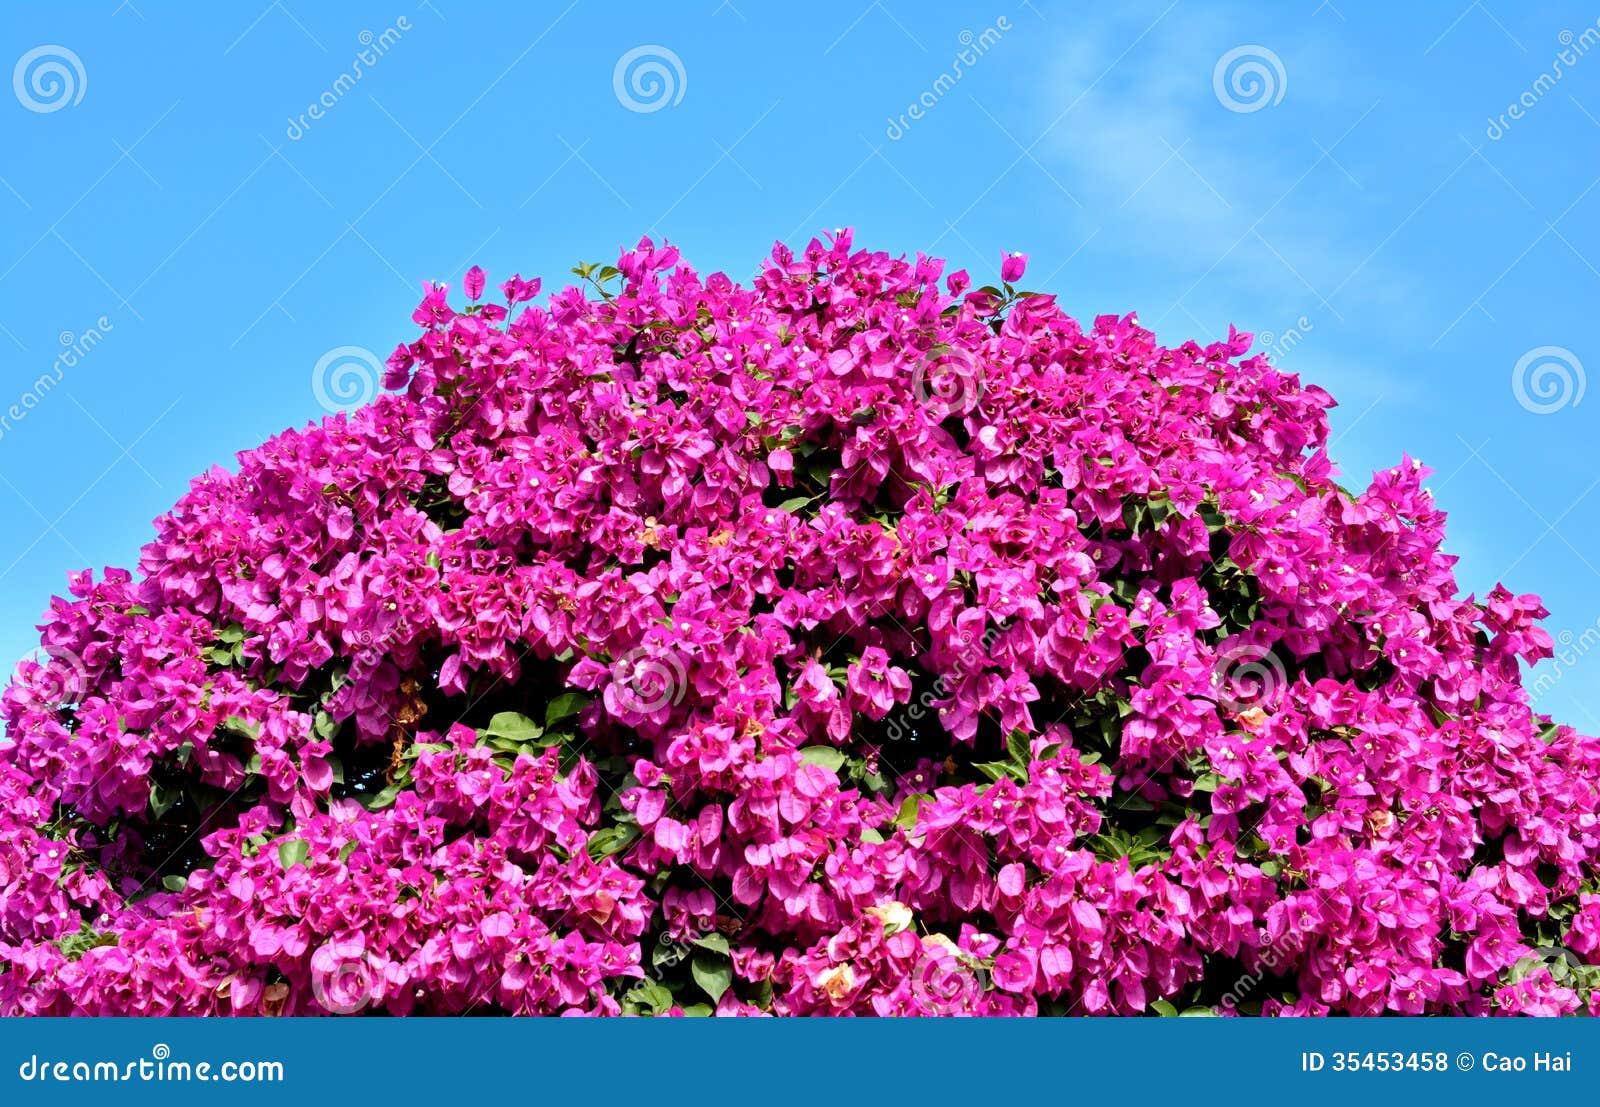 Purple Bougainvillea Flowers As Ball Shape Stock Photo ...